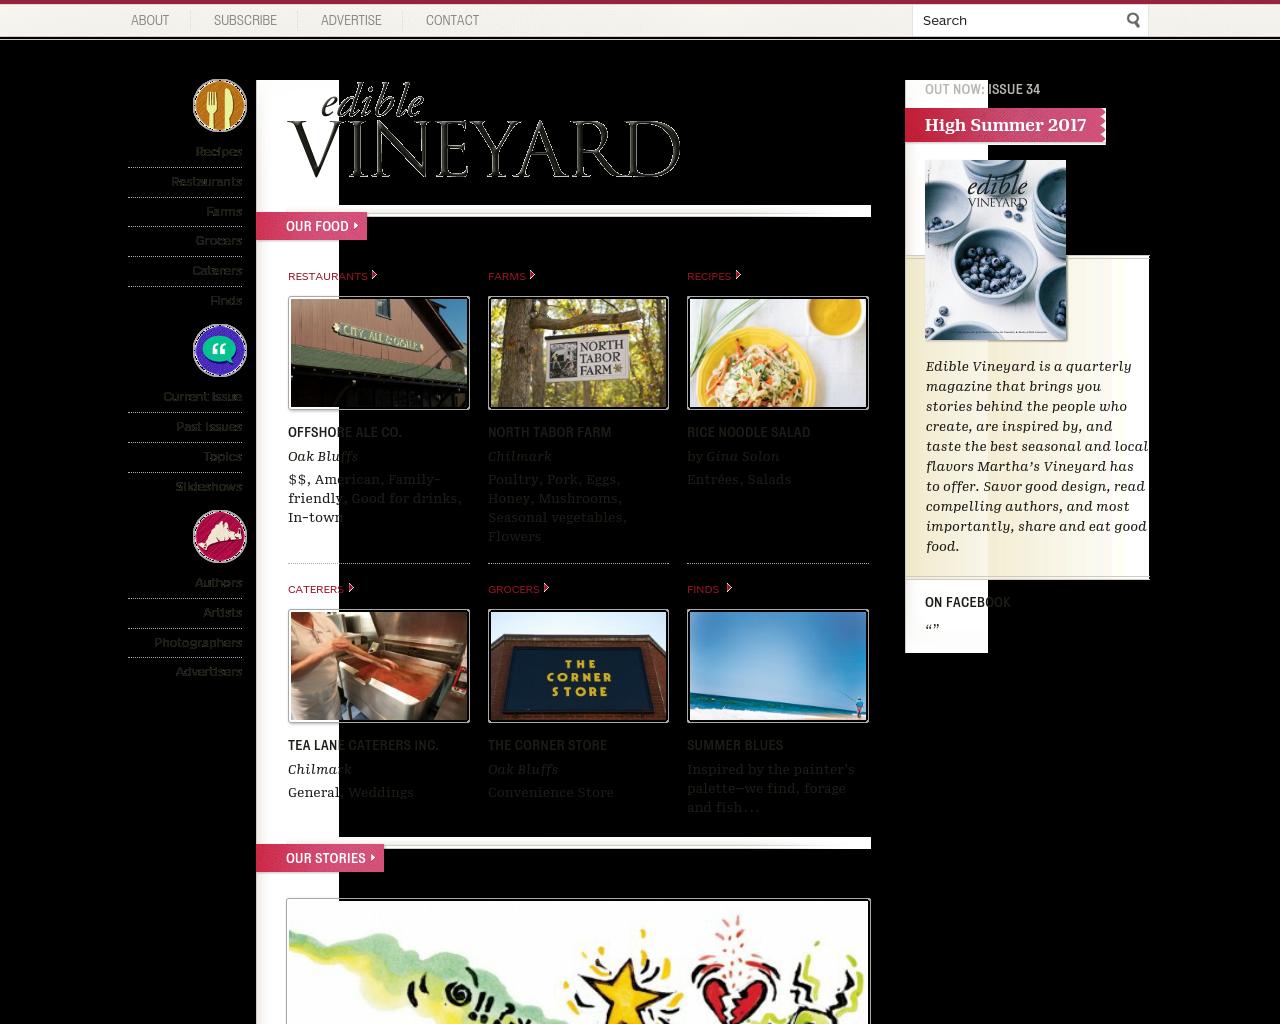 Edible-Vineyard-Advertising-Reviews-Pricing